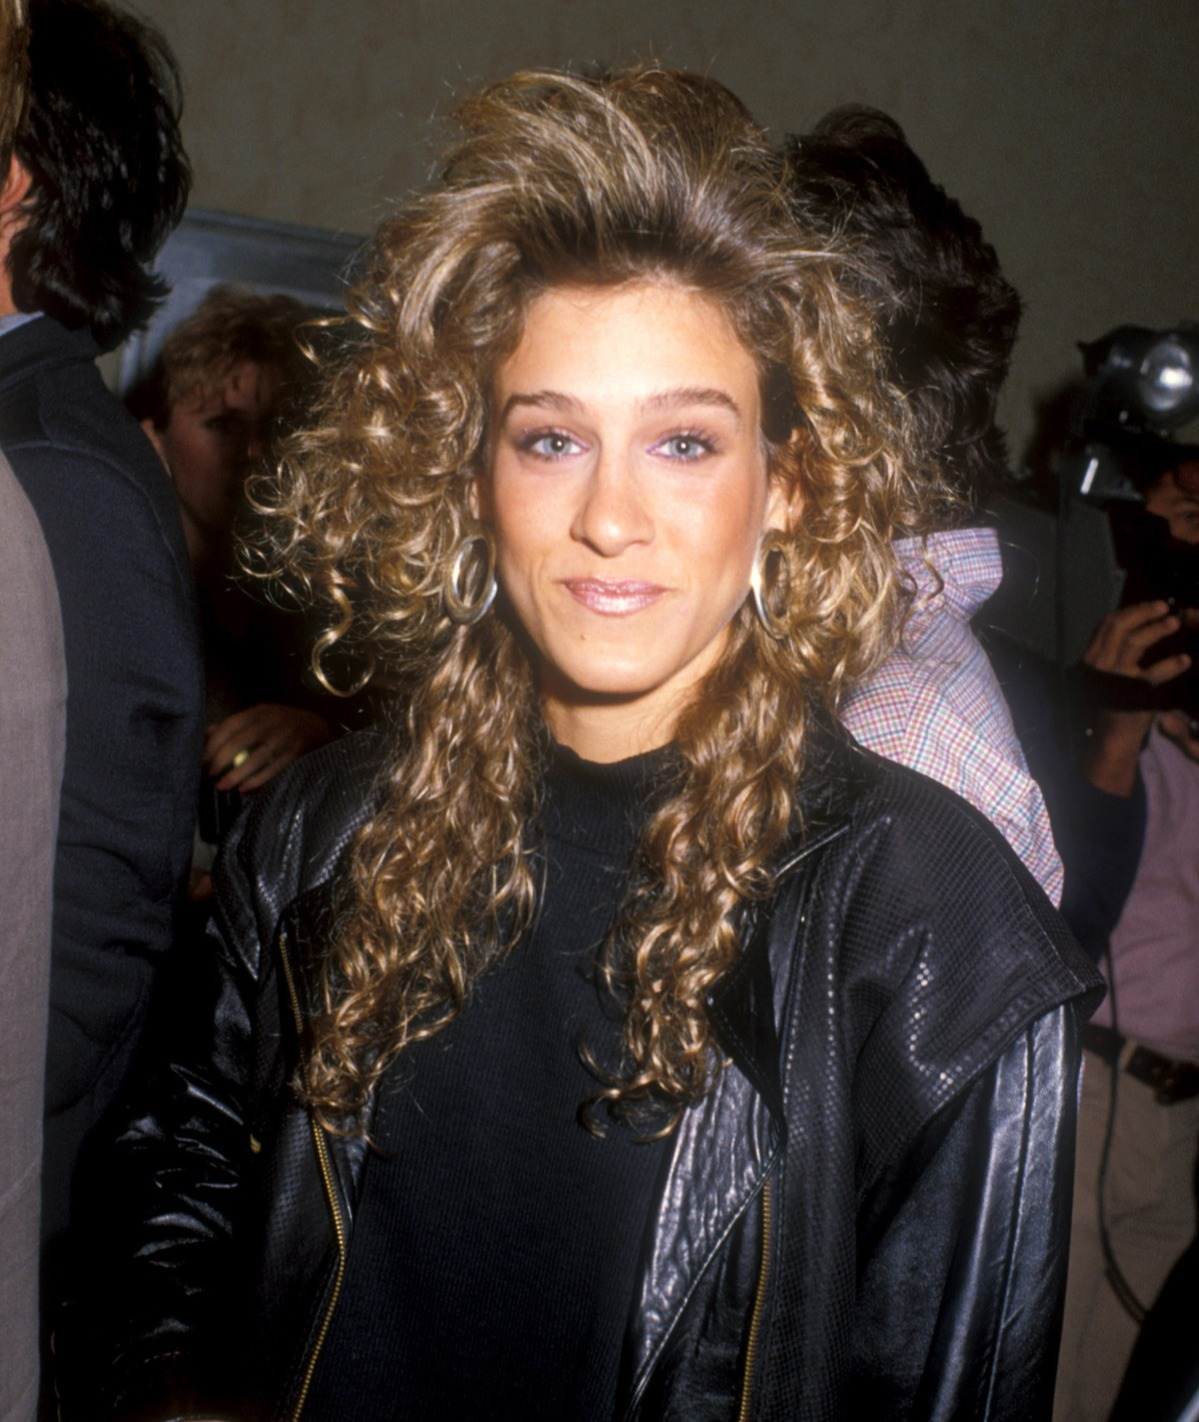 sarah jessica parker 1986 film premier